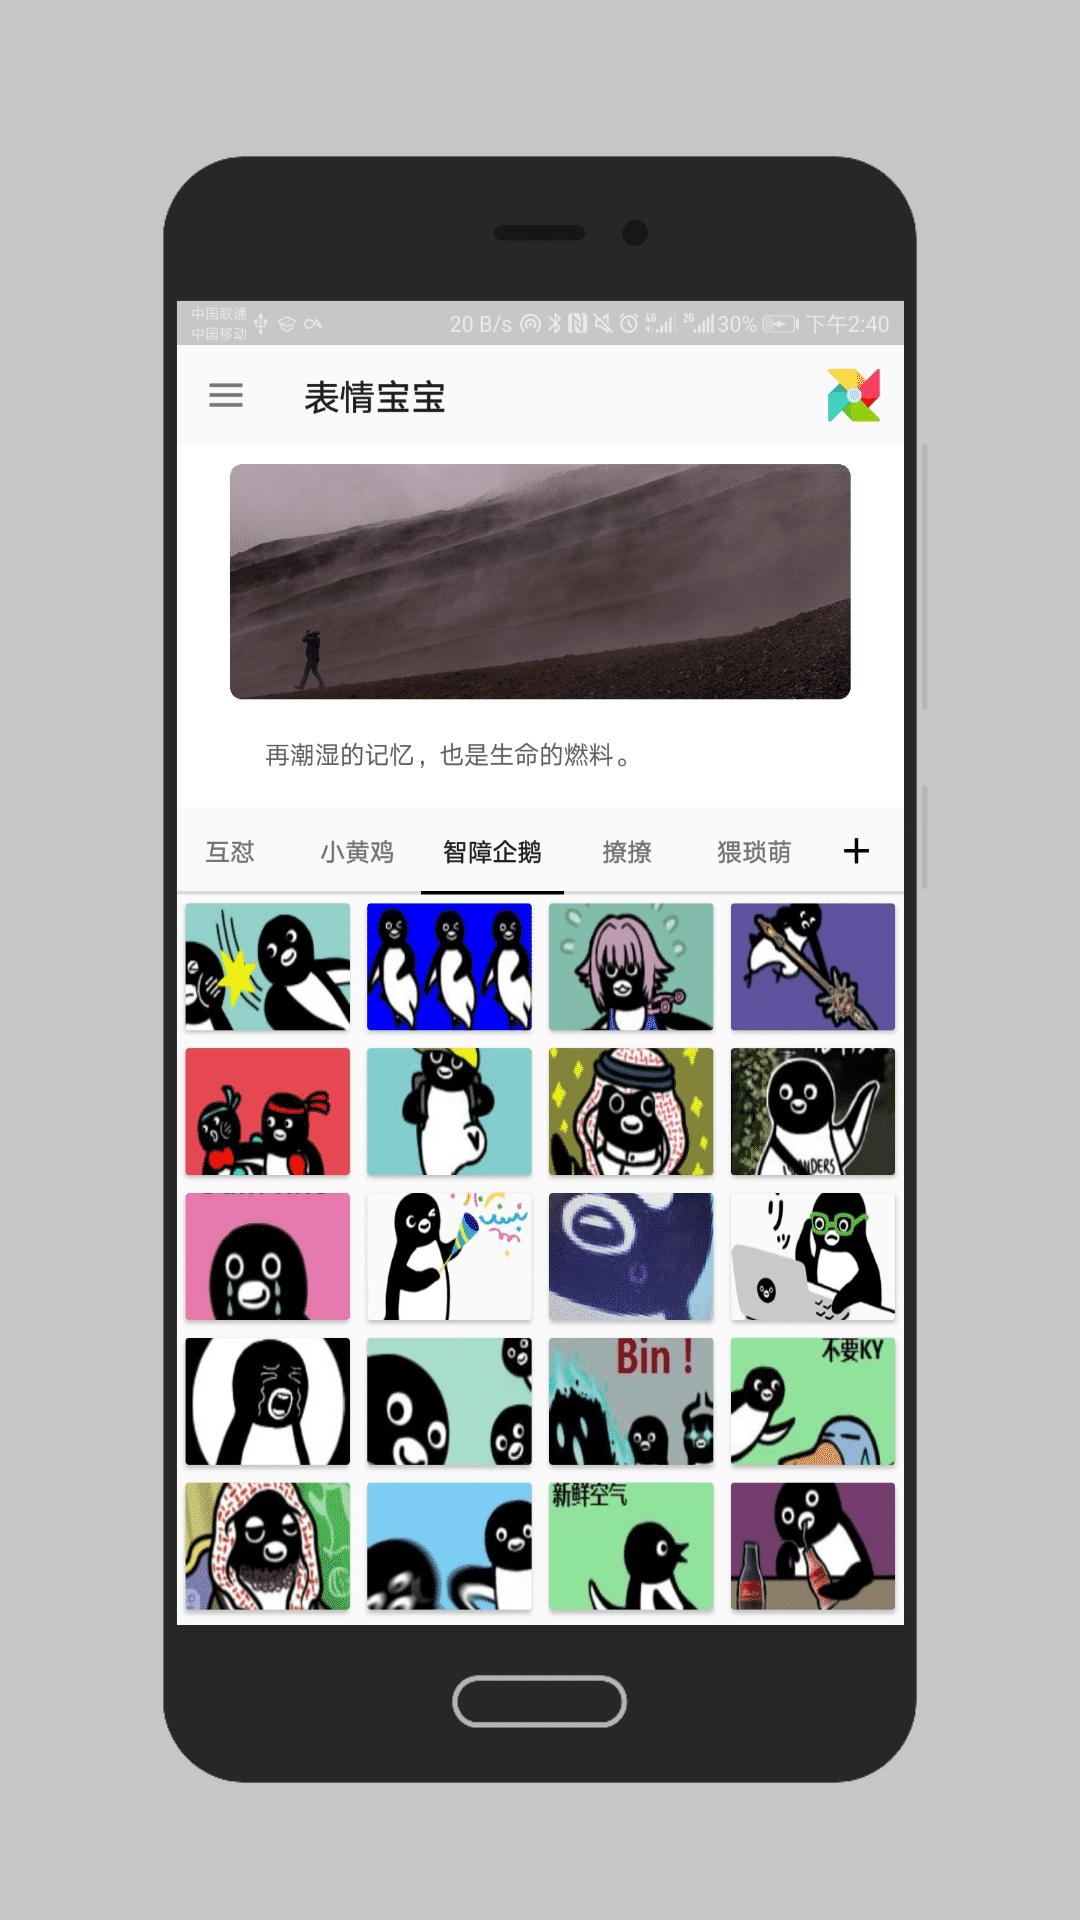 screenshot_1531118873 (1).png